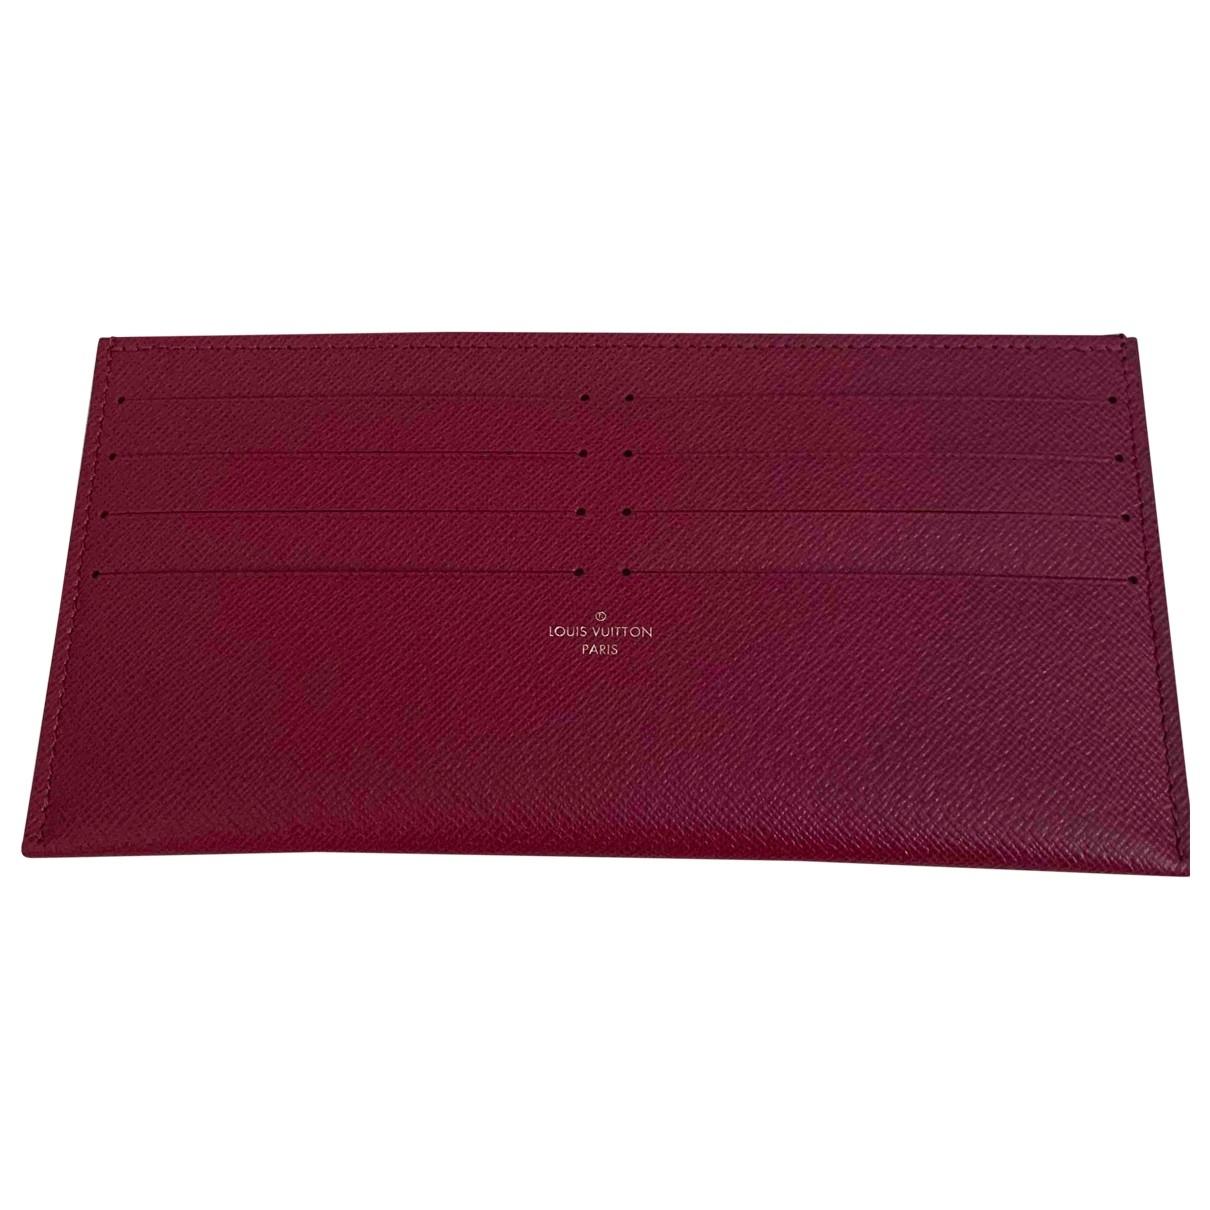 Louis Vuitton \N Burgundy Leather Purses, wallet & cases for Women \N